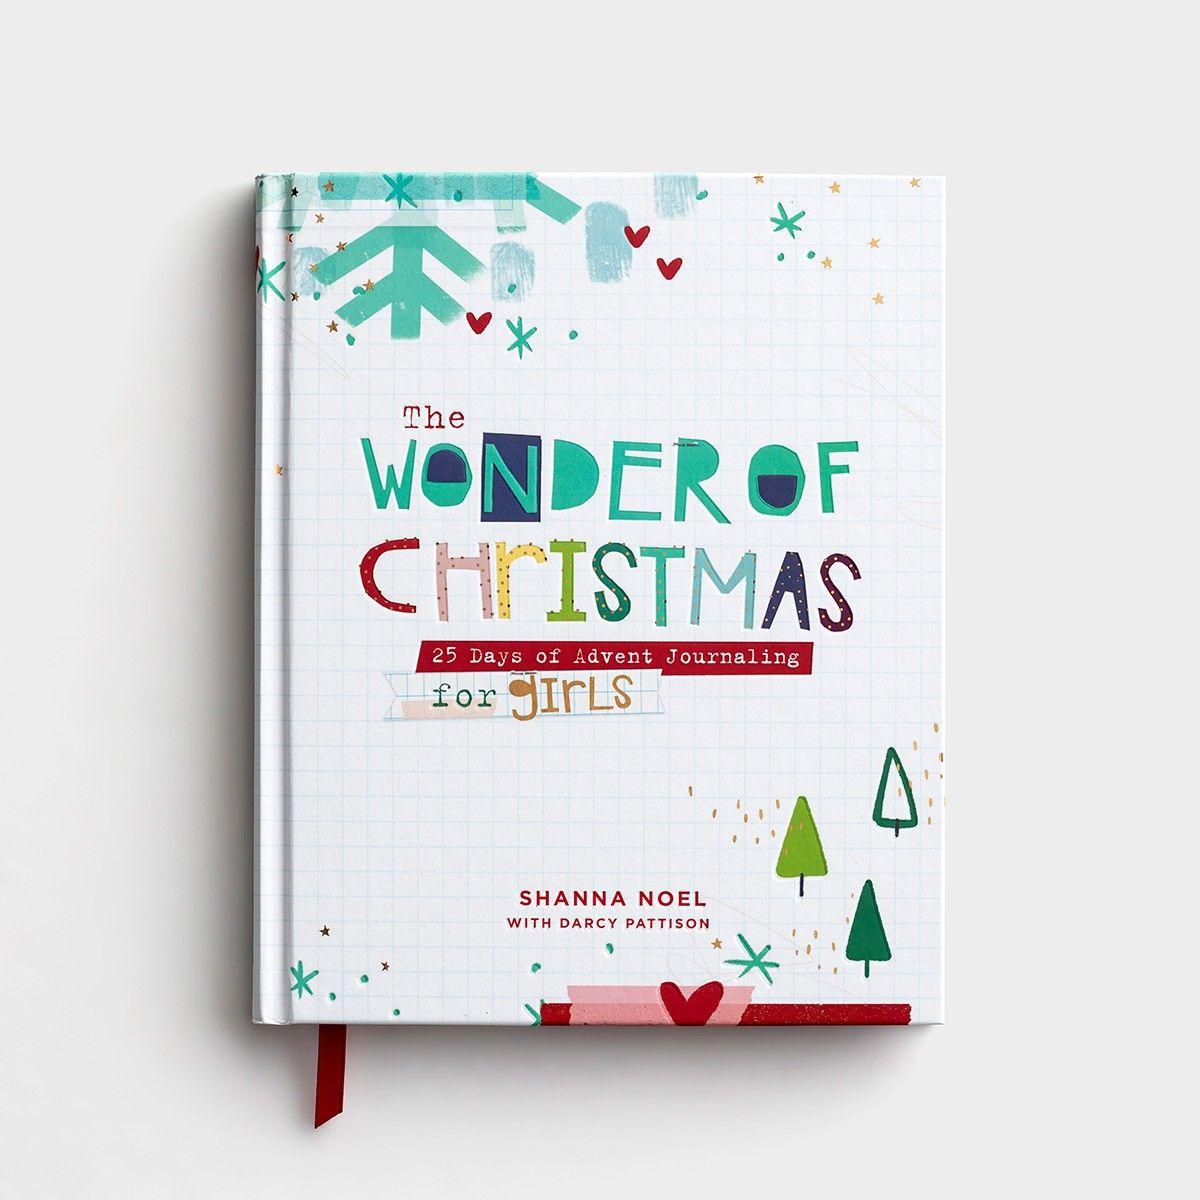 Shanna Noel The Wonder of Christmas Advent Journal for